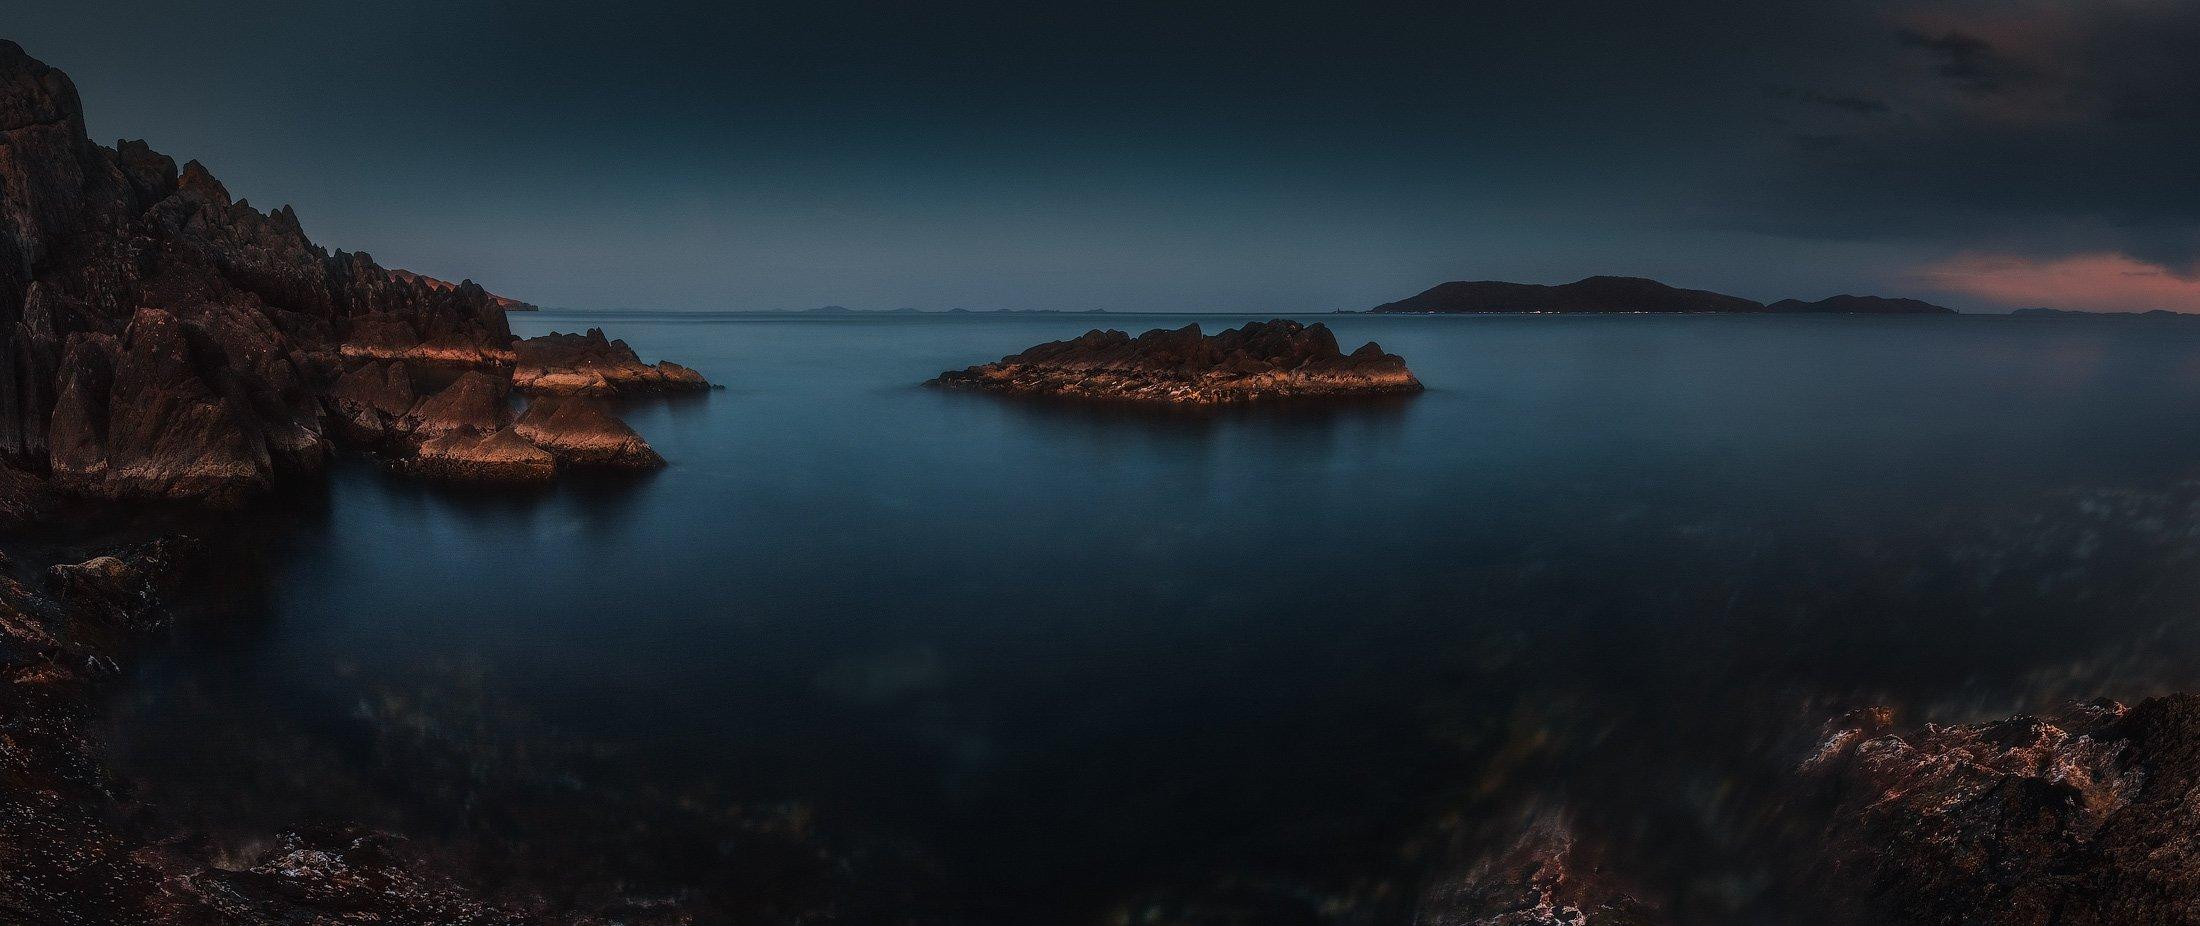 панорама, сумерки, весна, море, скалы, камни, Андрей Кровлин